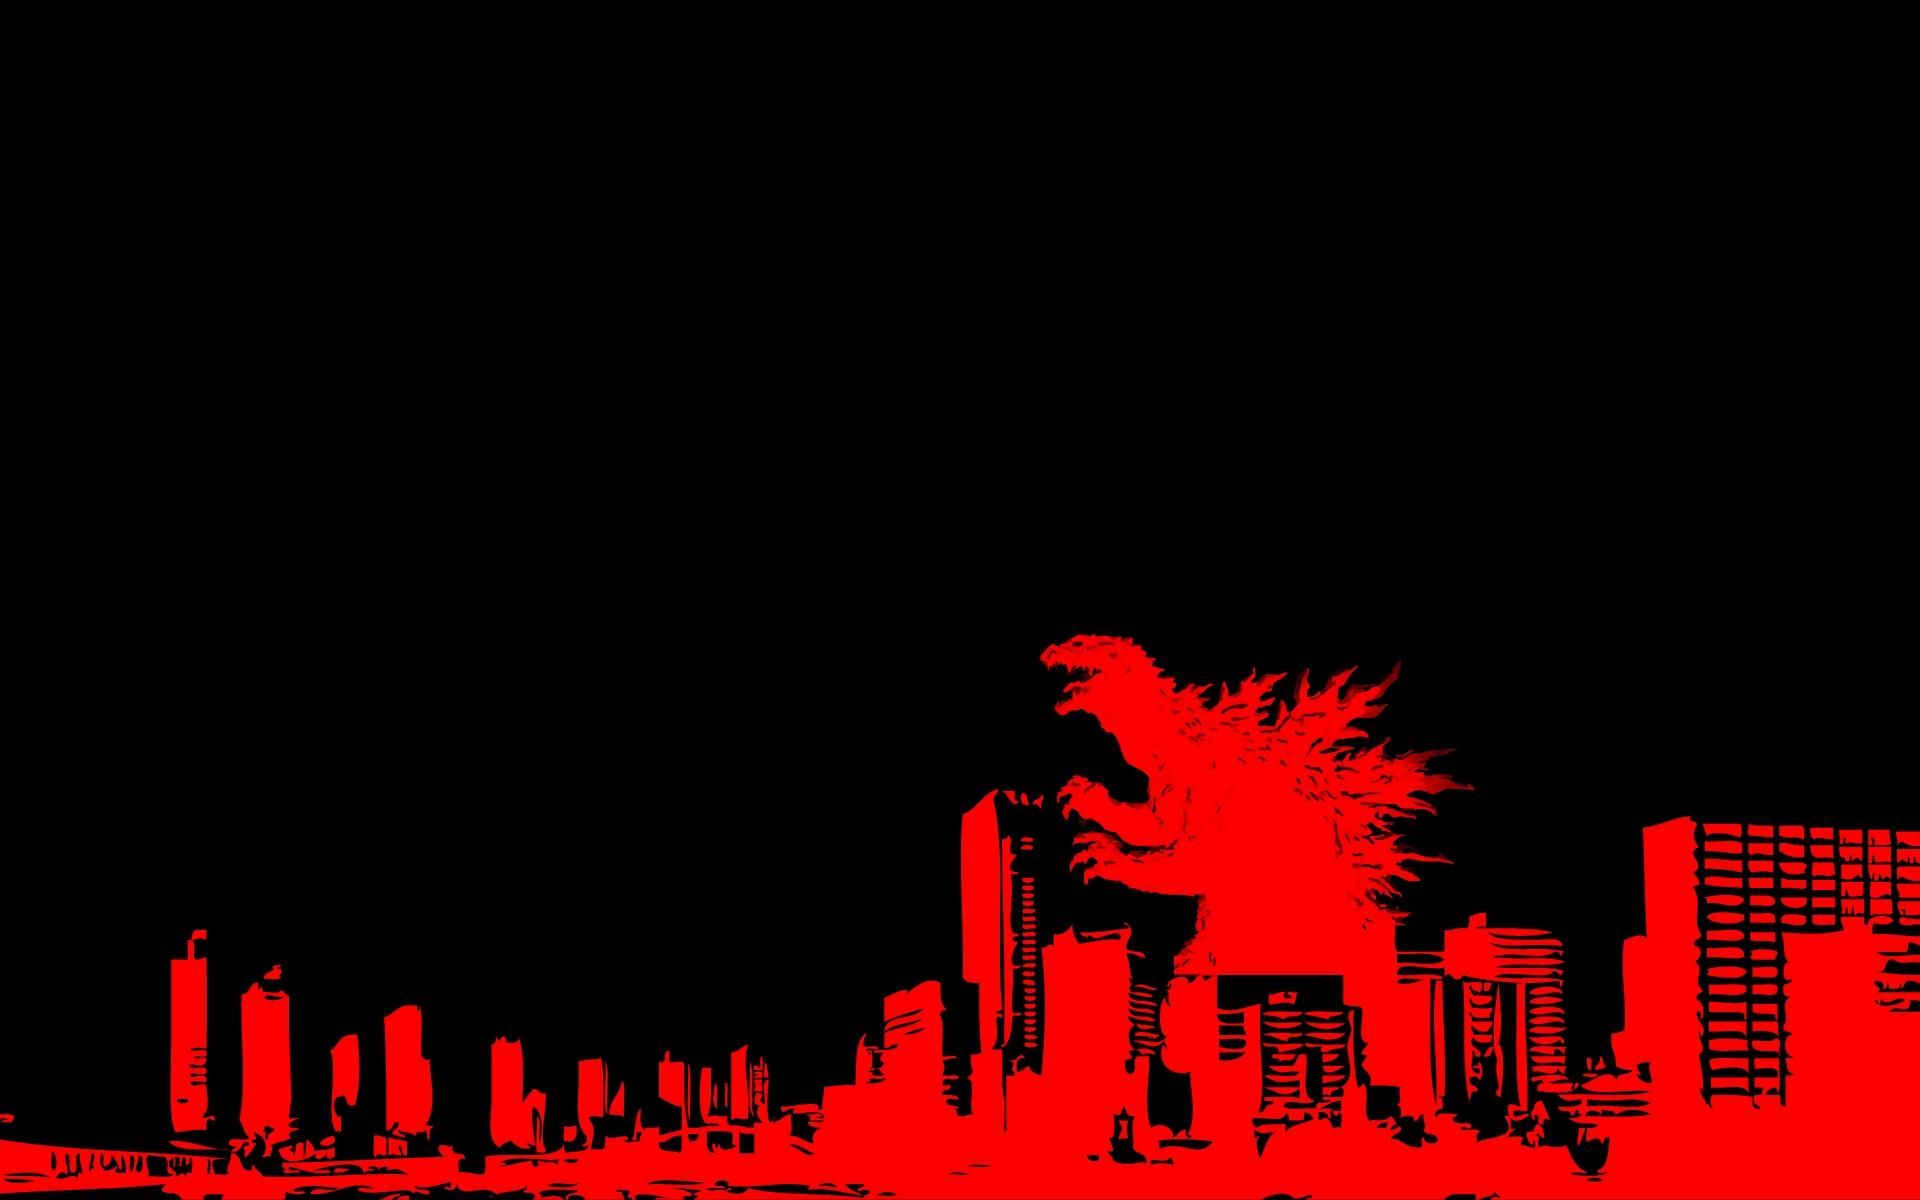 Godzilla Wallpaper Hd 1920x1080 Godzilla Full Hd Papel De Parede And Background Image